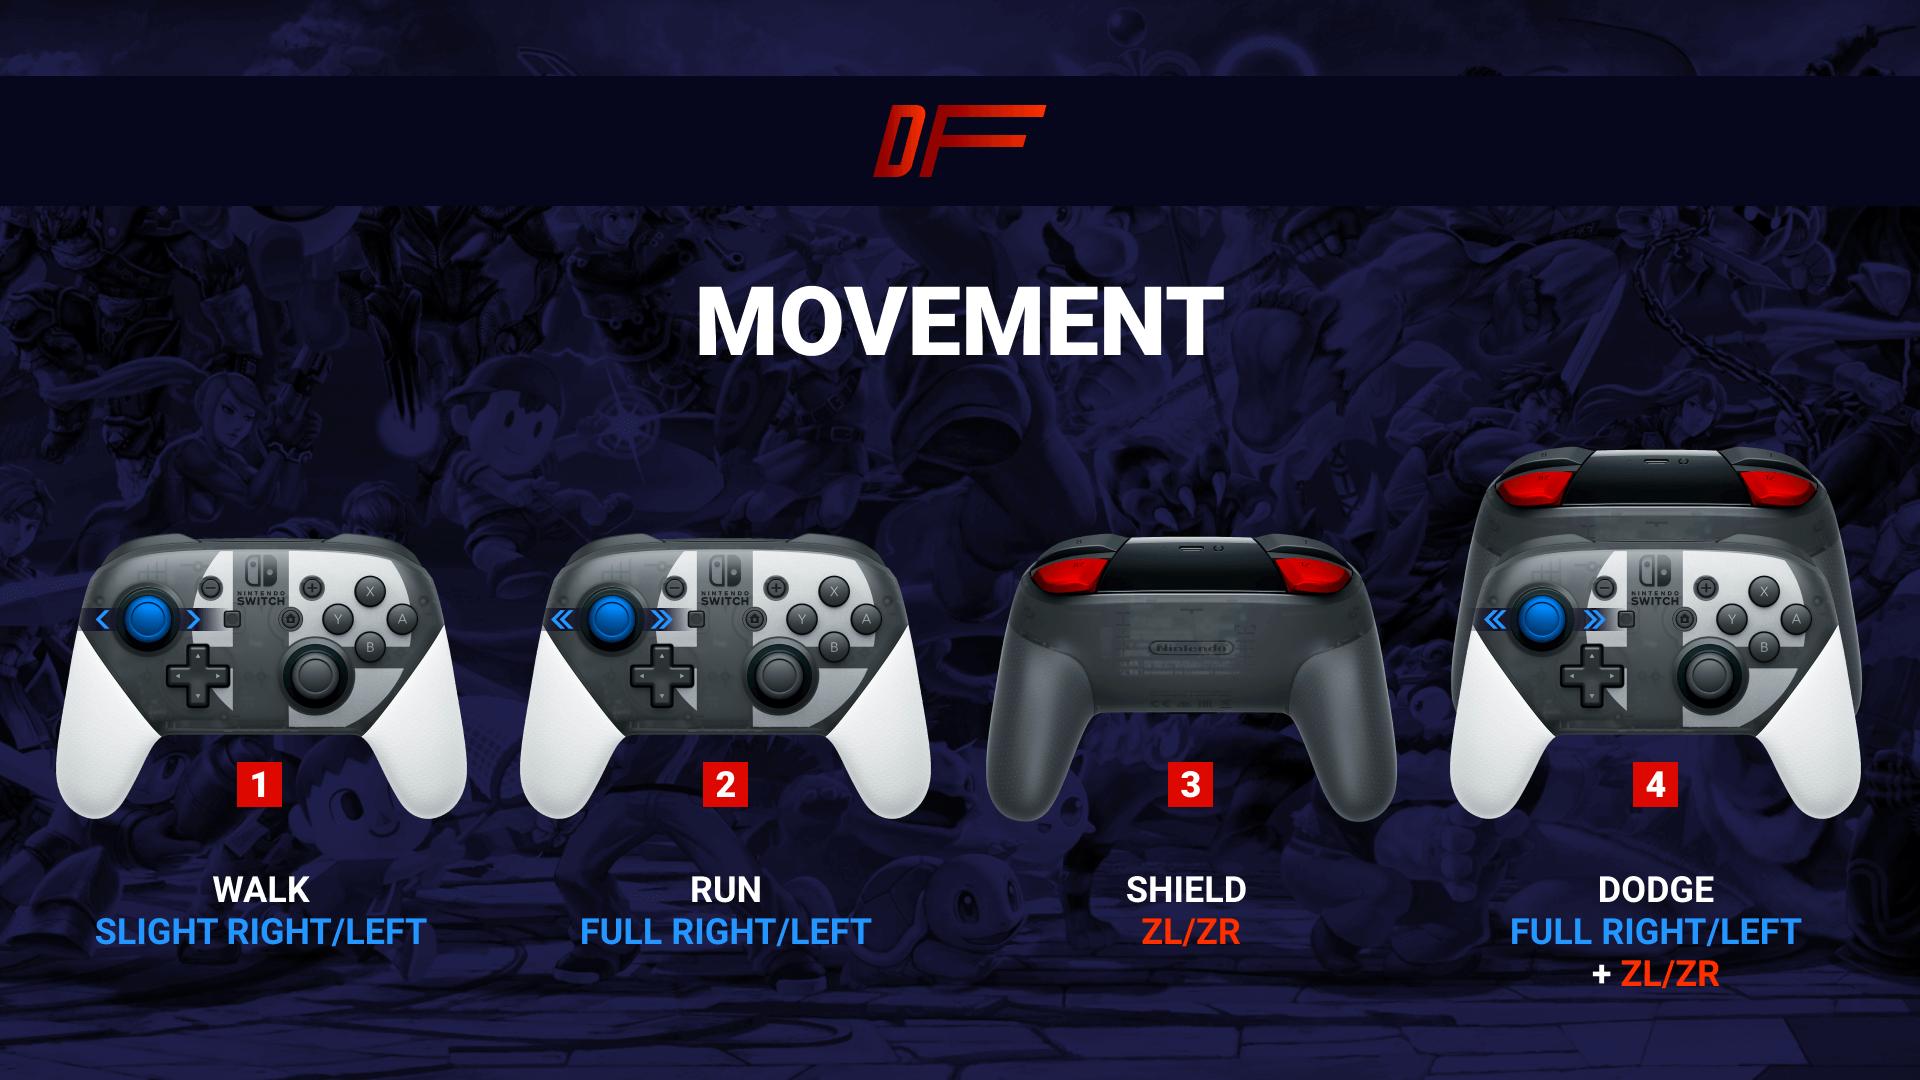 Controls in Smash Ultimate: Movement